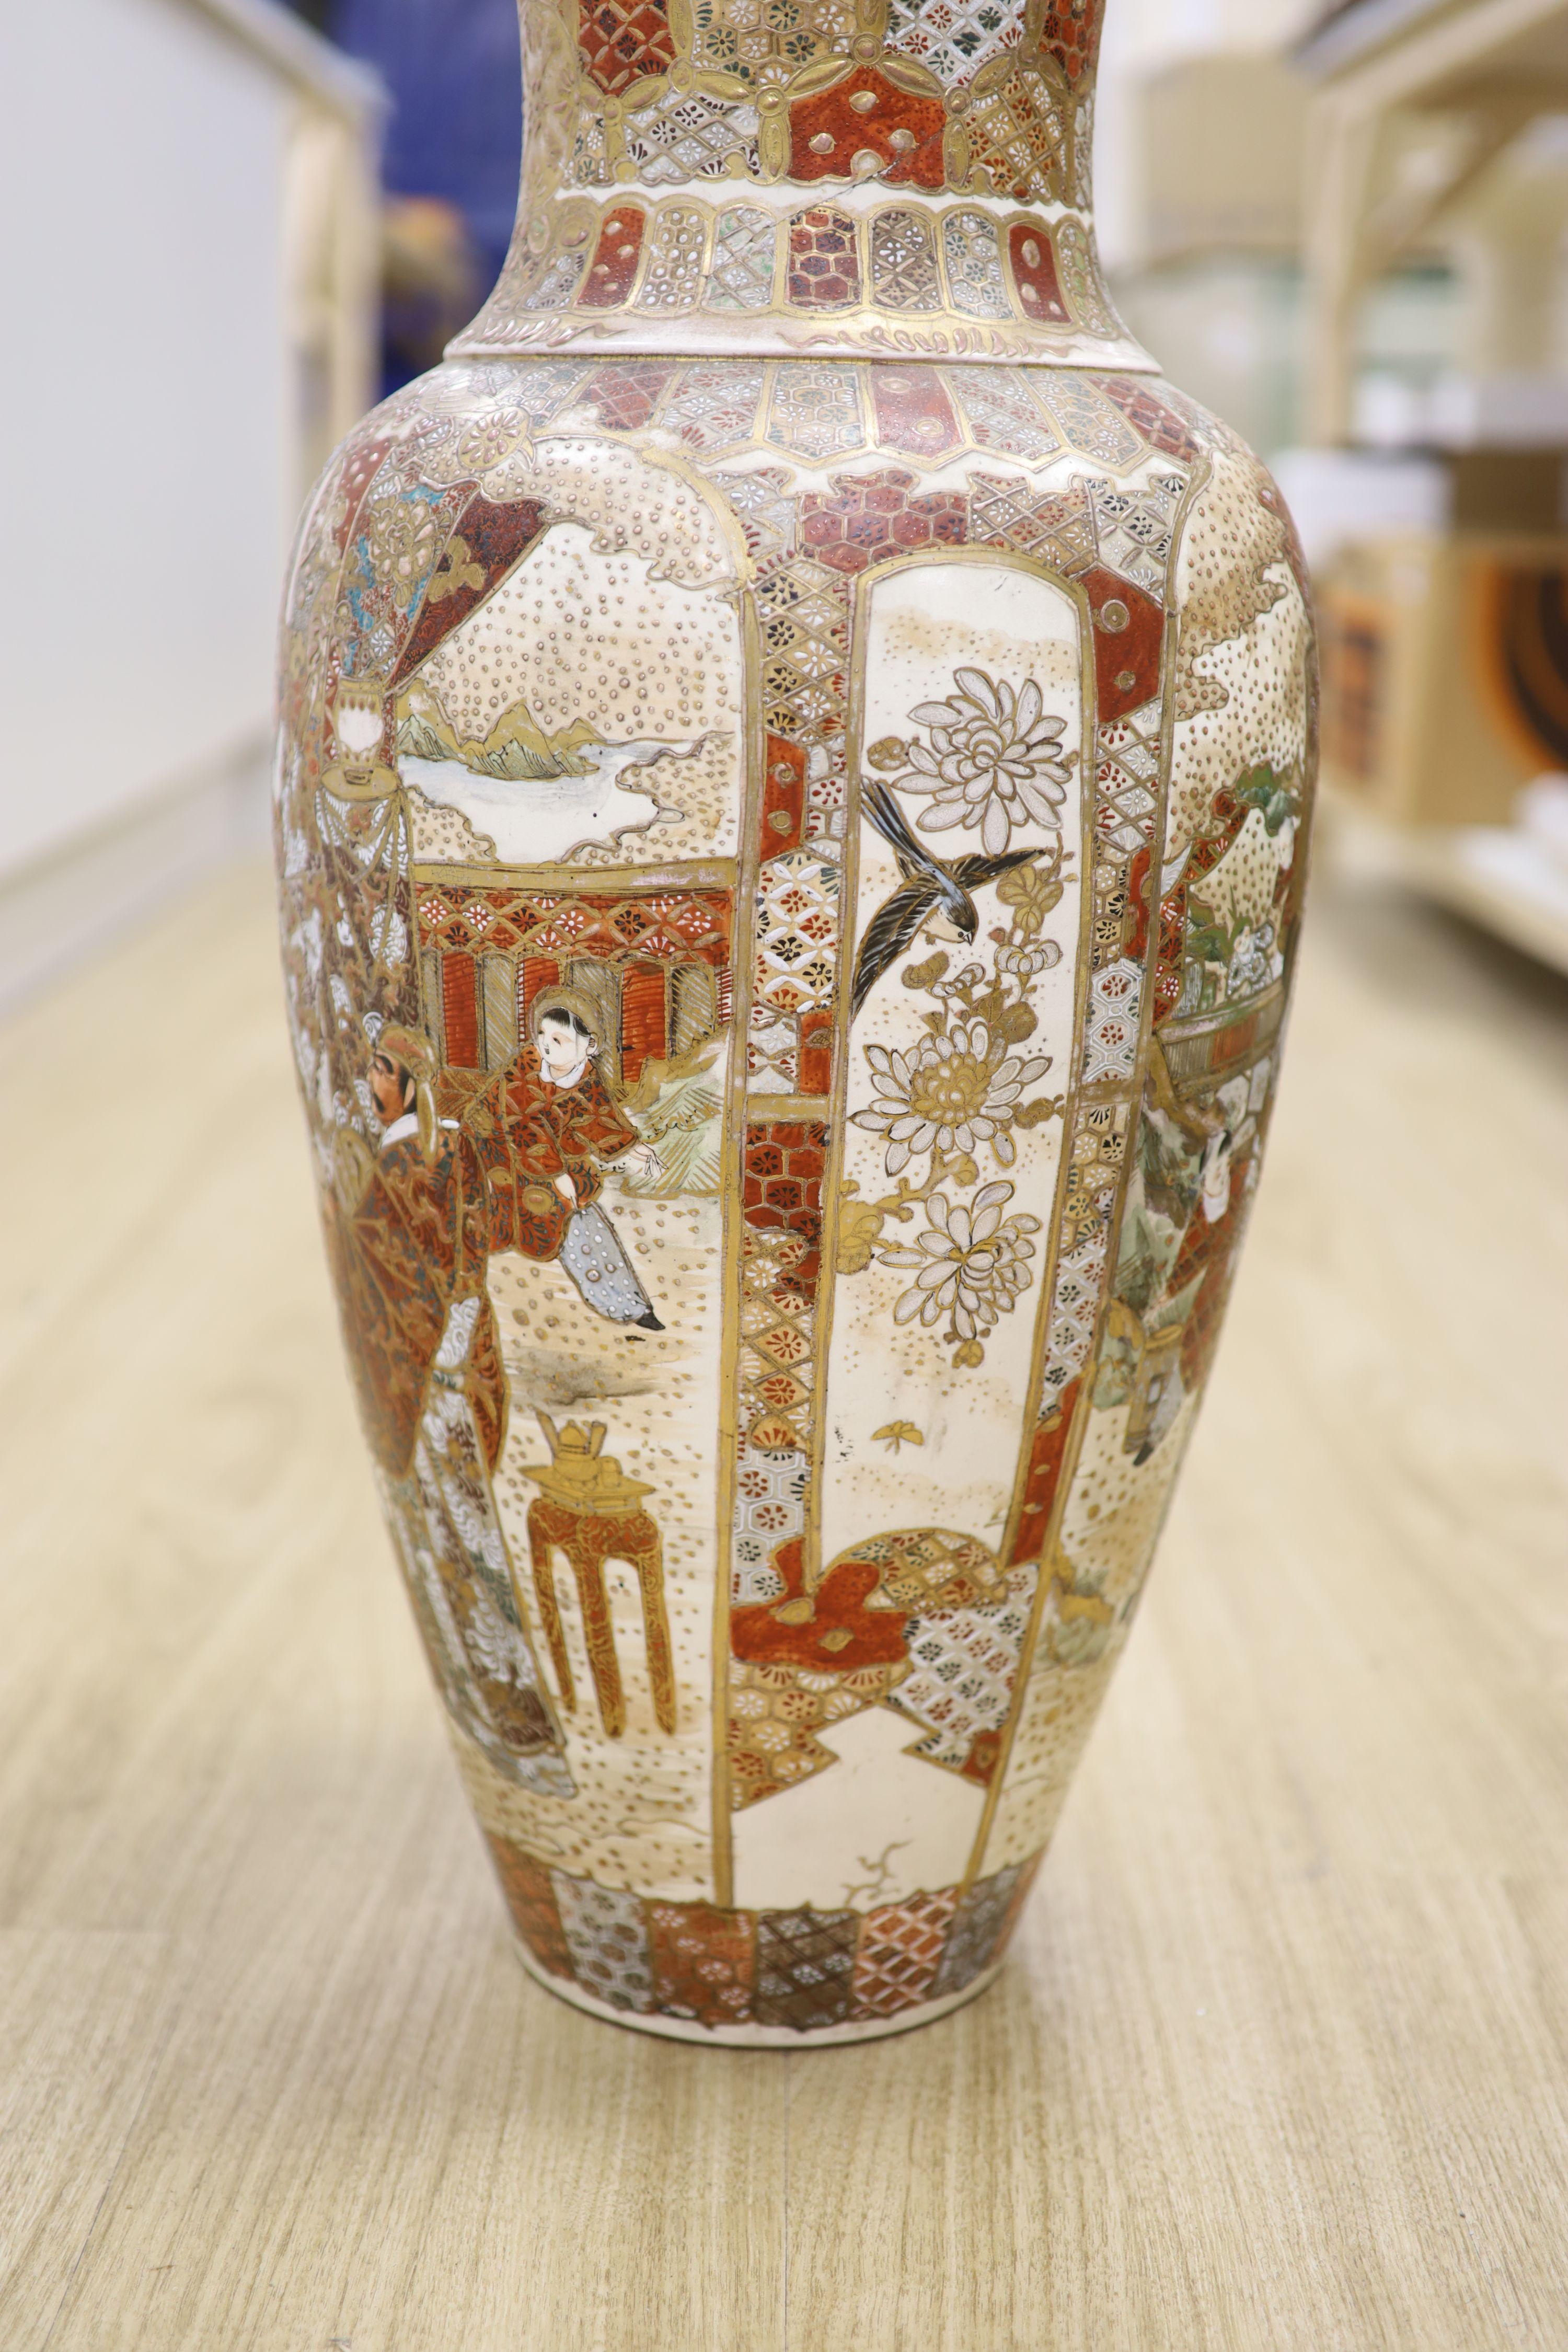 A large Satsuma pottery vase, height 63cm - Image 6 of 8